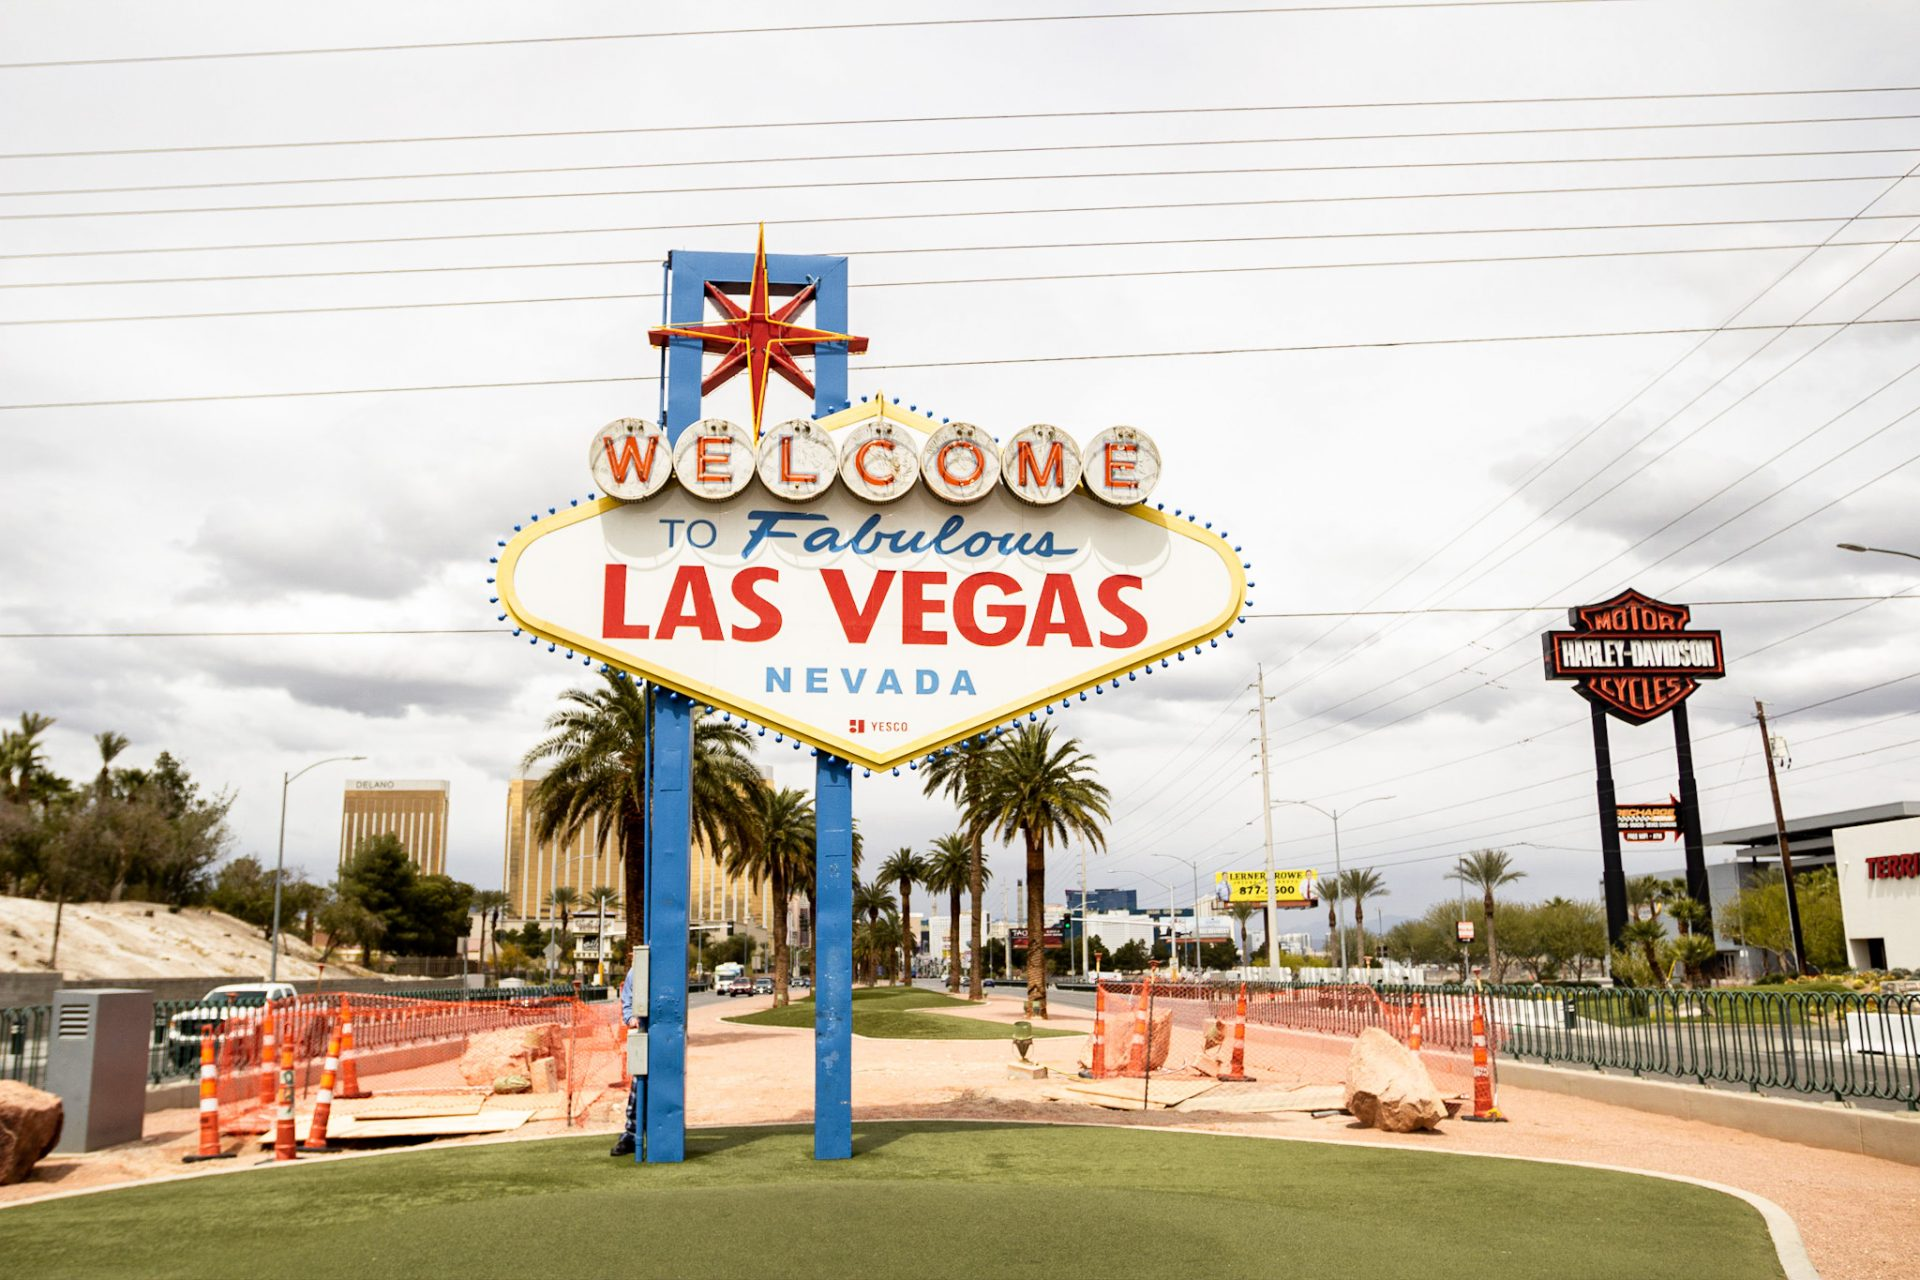 Las Vegas Itinerary – 4 Days in Sin City!